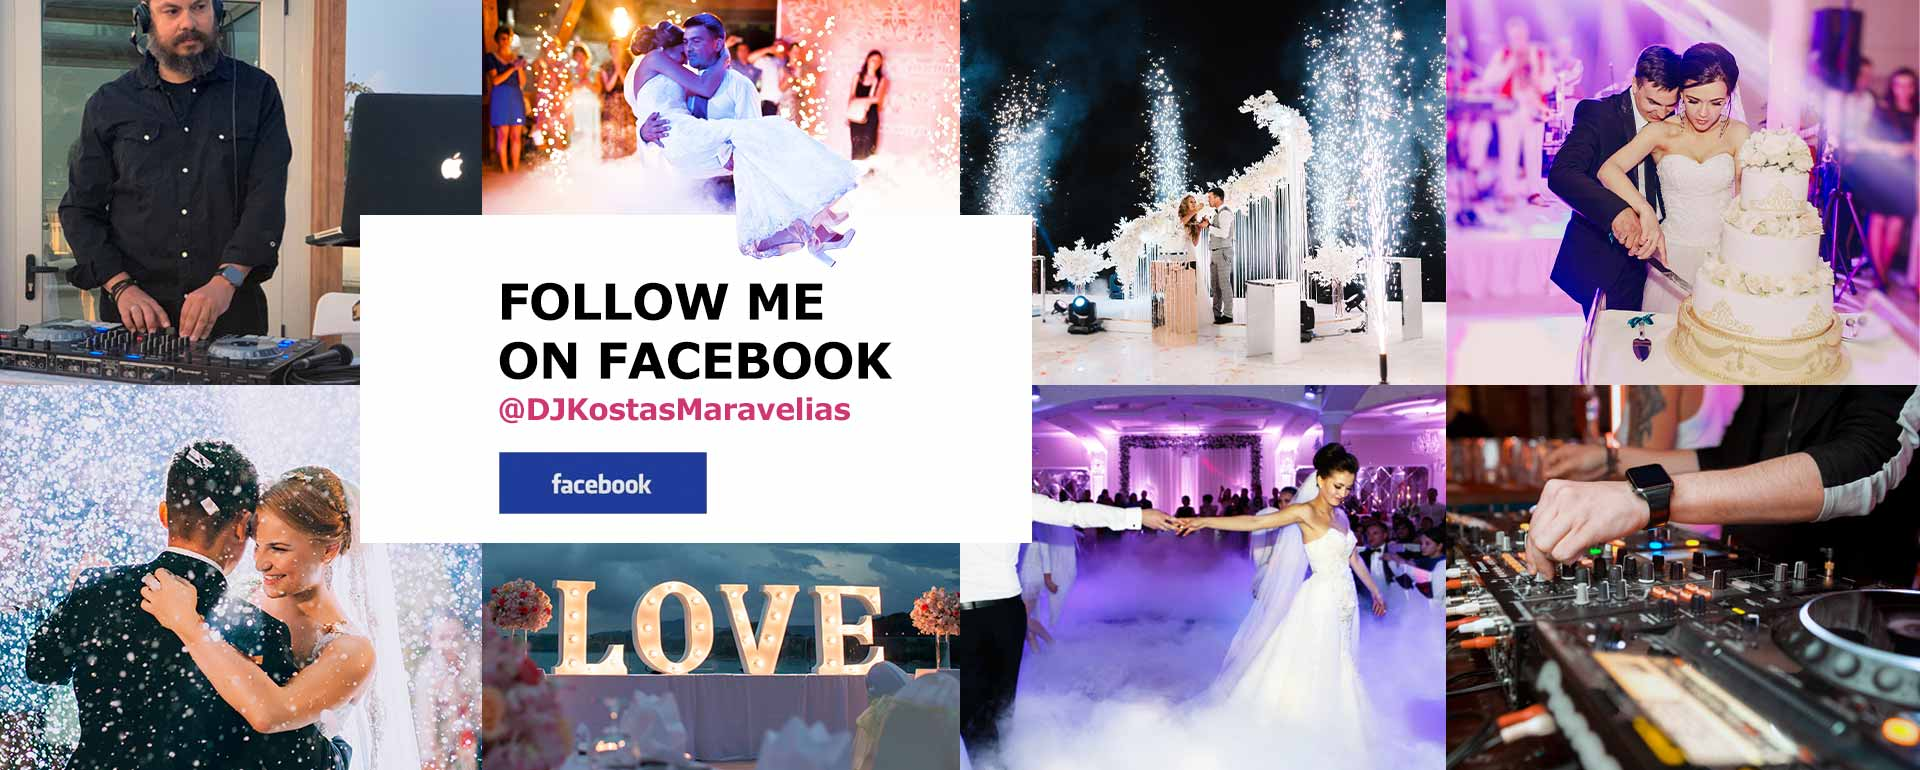 dj-rhodes-wedding-services-facebook--kostas-maravelias